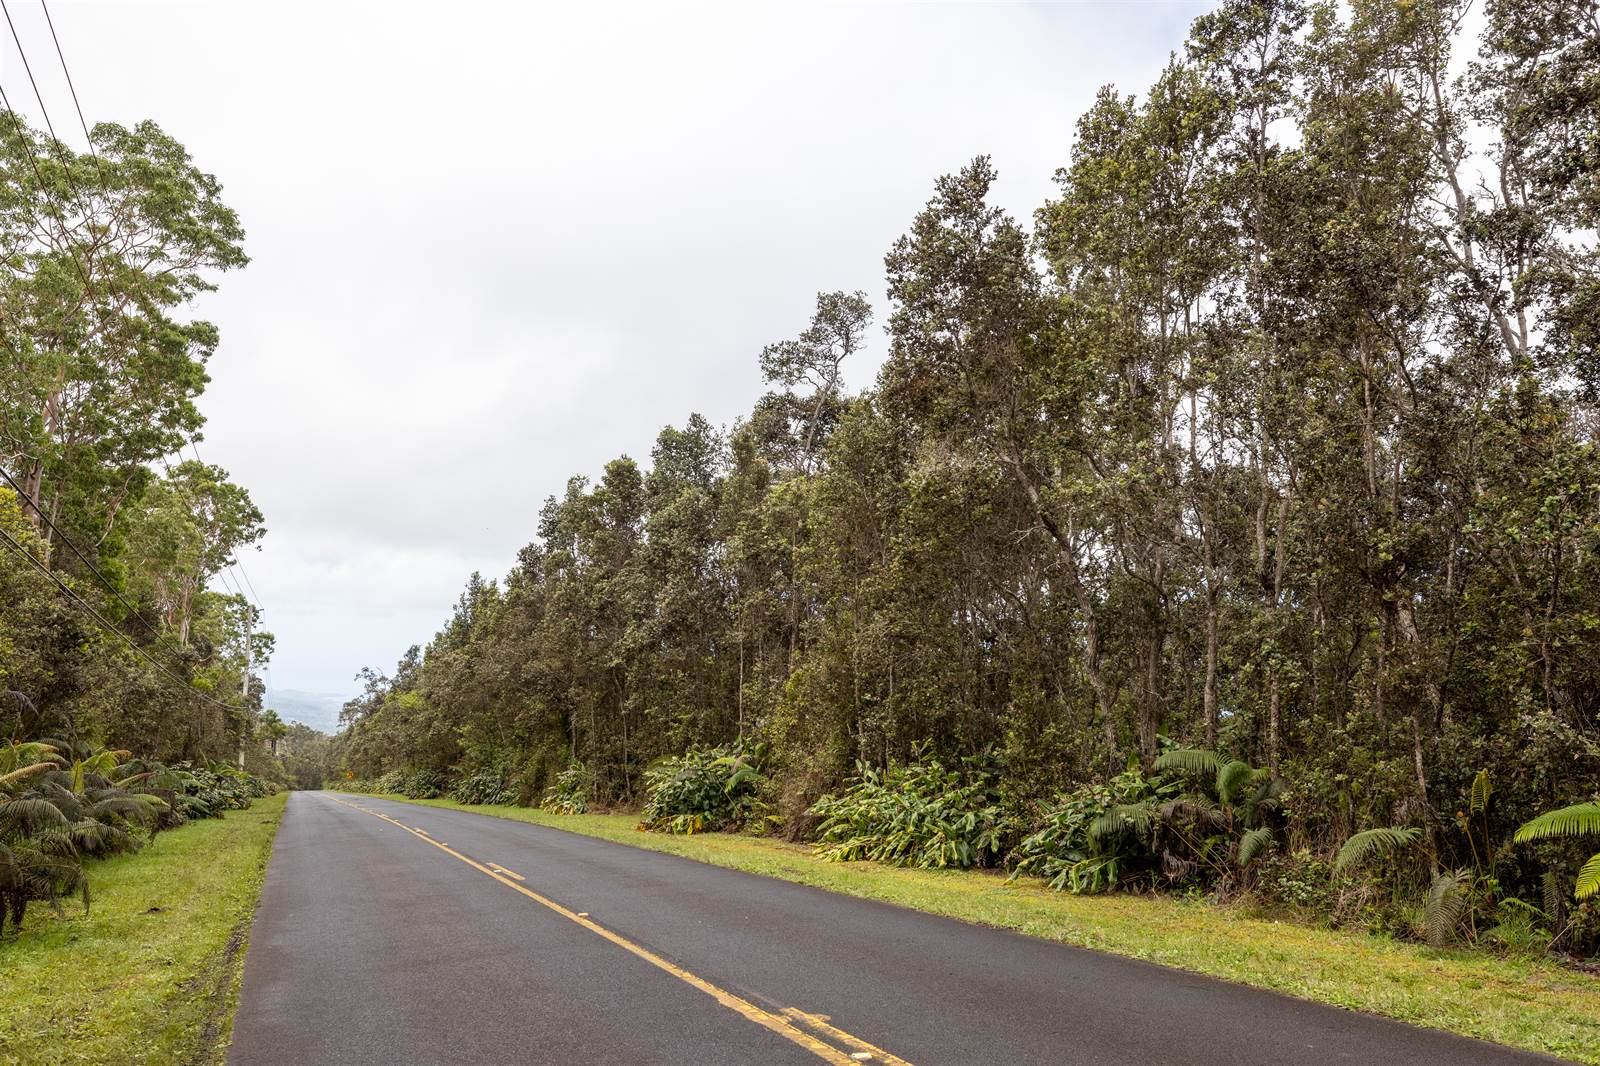 73-2335 Kaloko Drive, Lot 3-A, Kailua-Kona, HI 96740